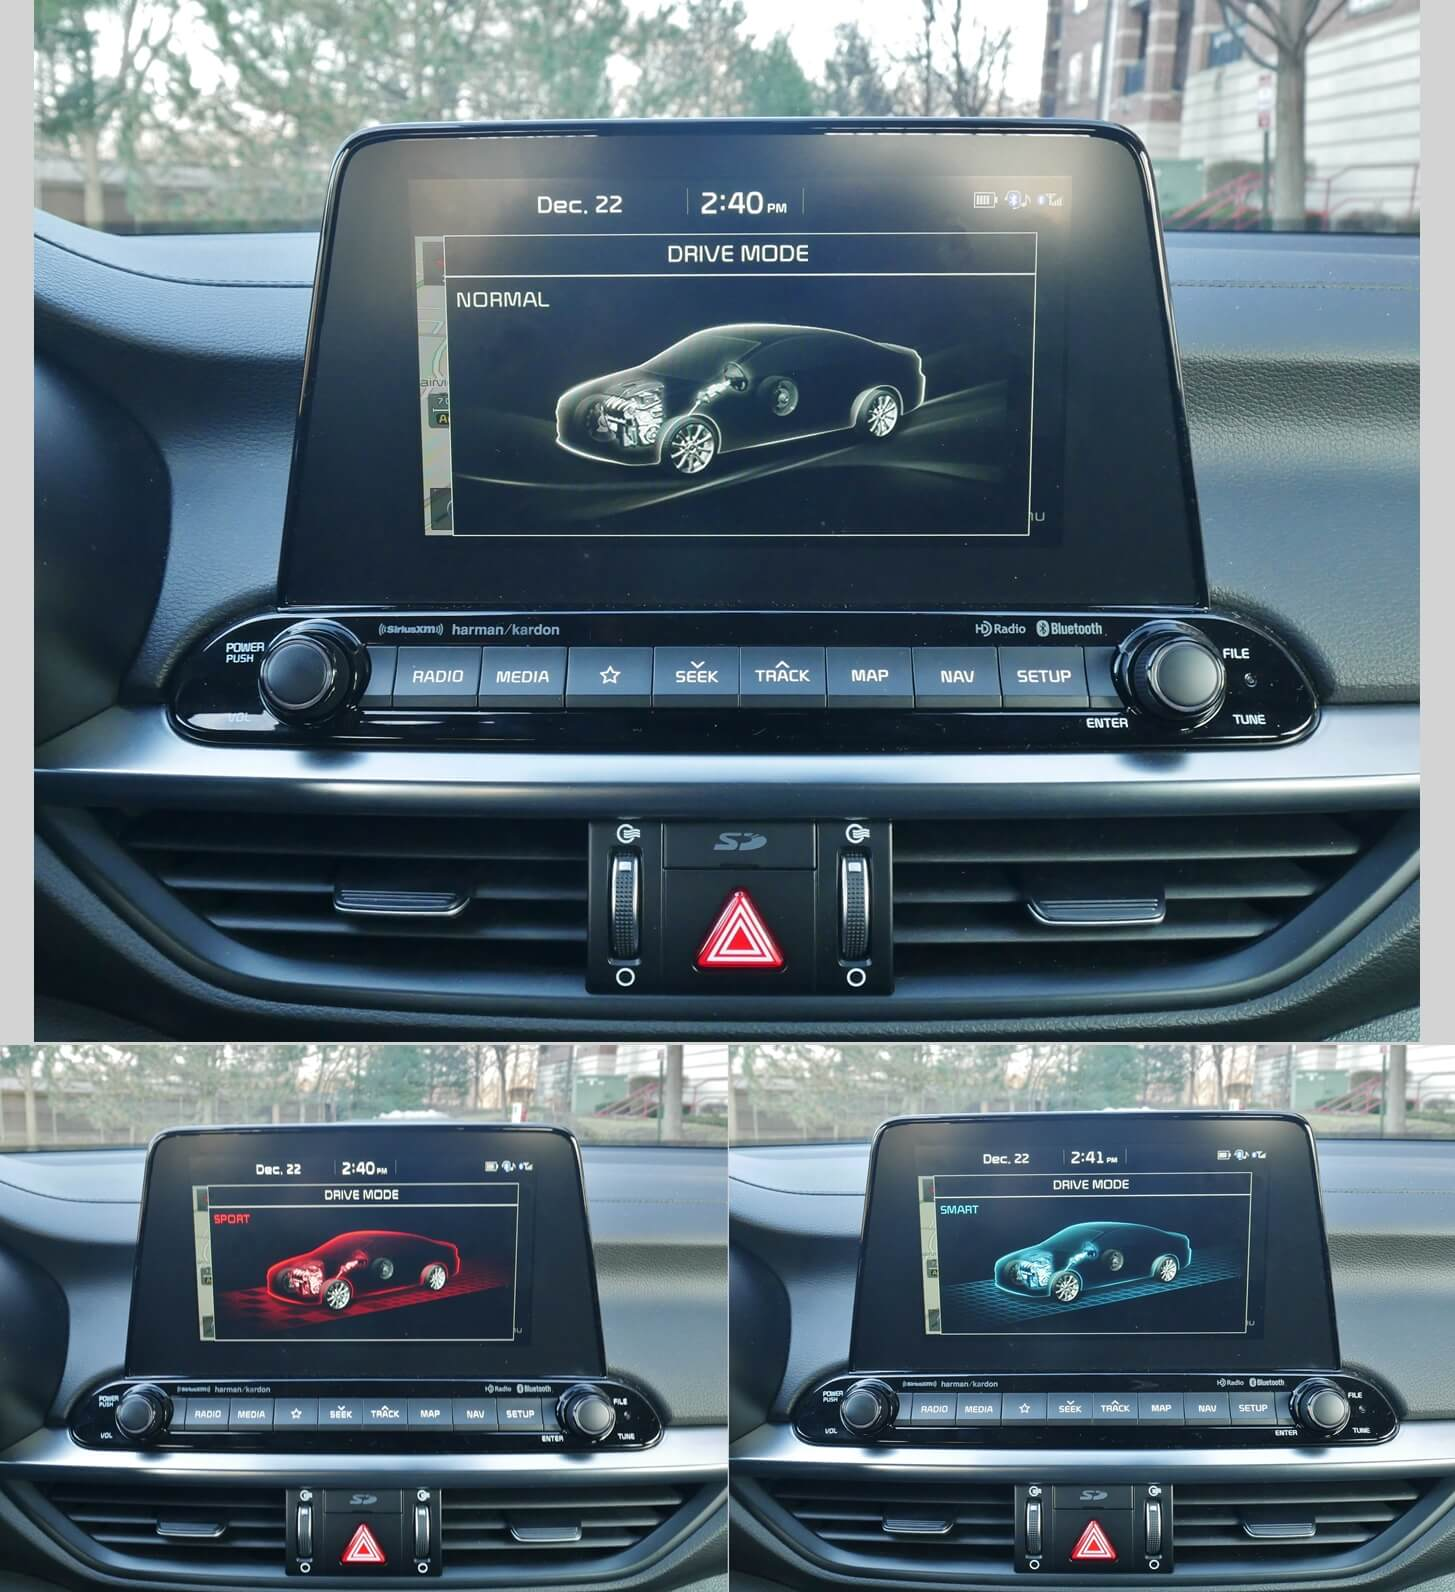 2019 Kia Forte Interior: 2019 Kia Forte EX – Bottom Line Review